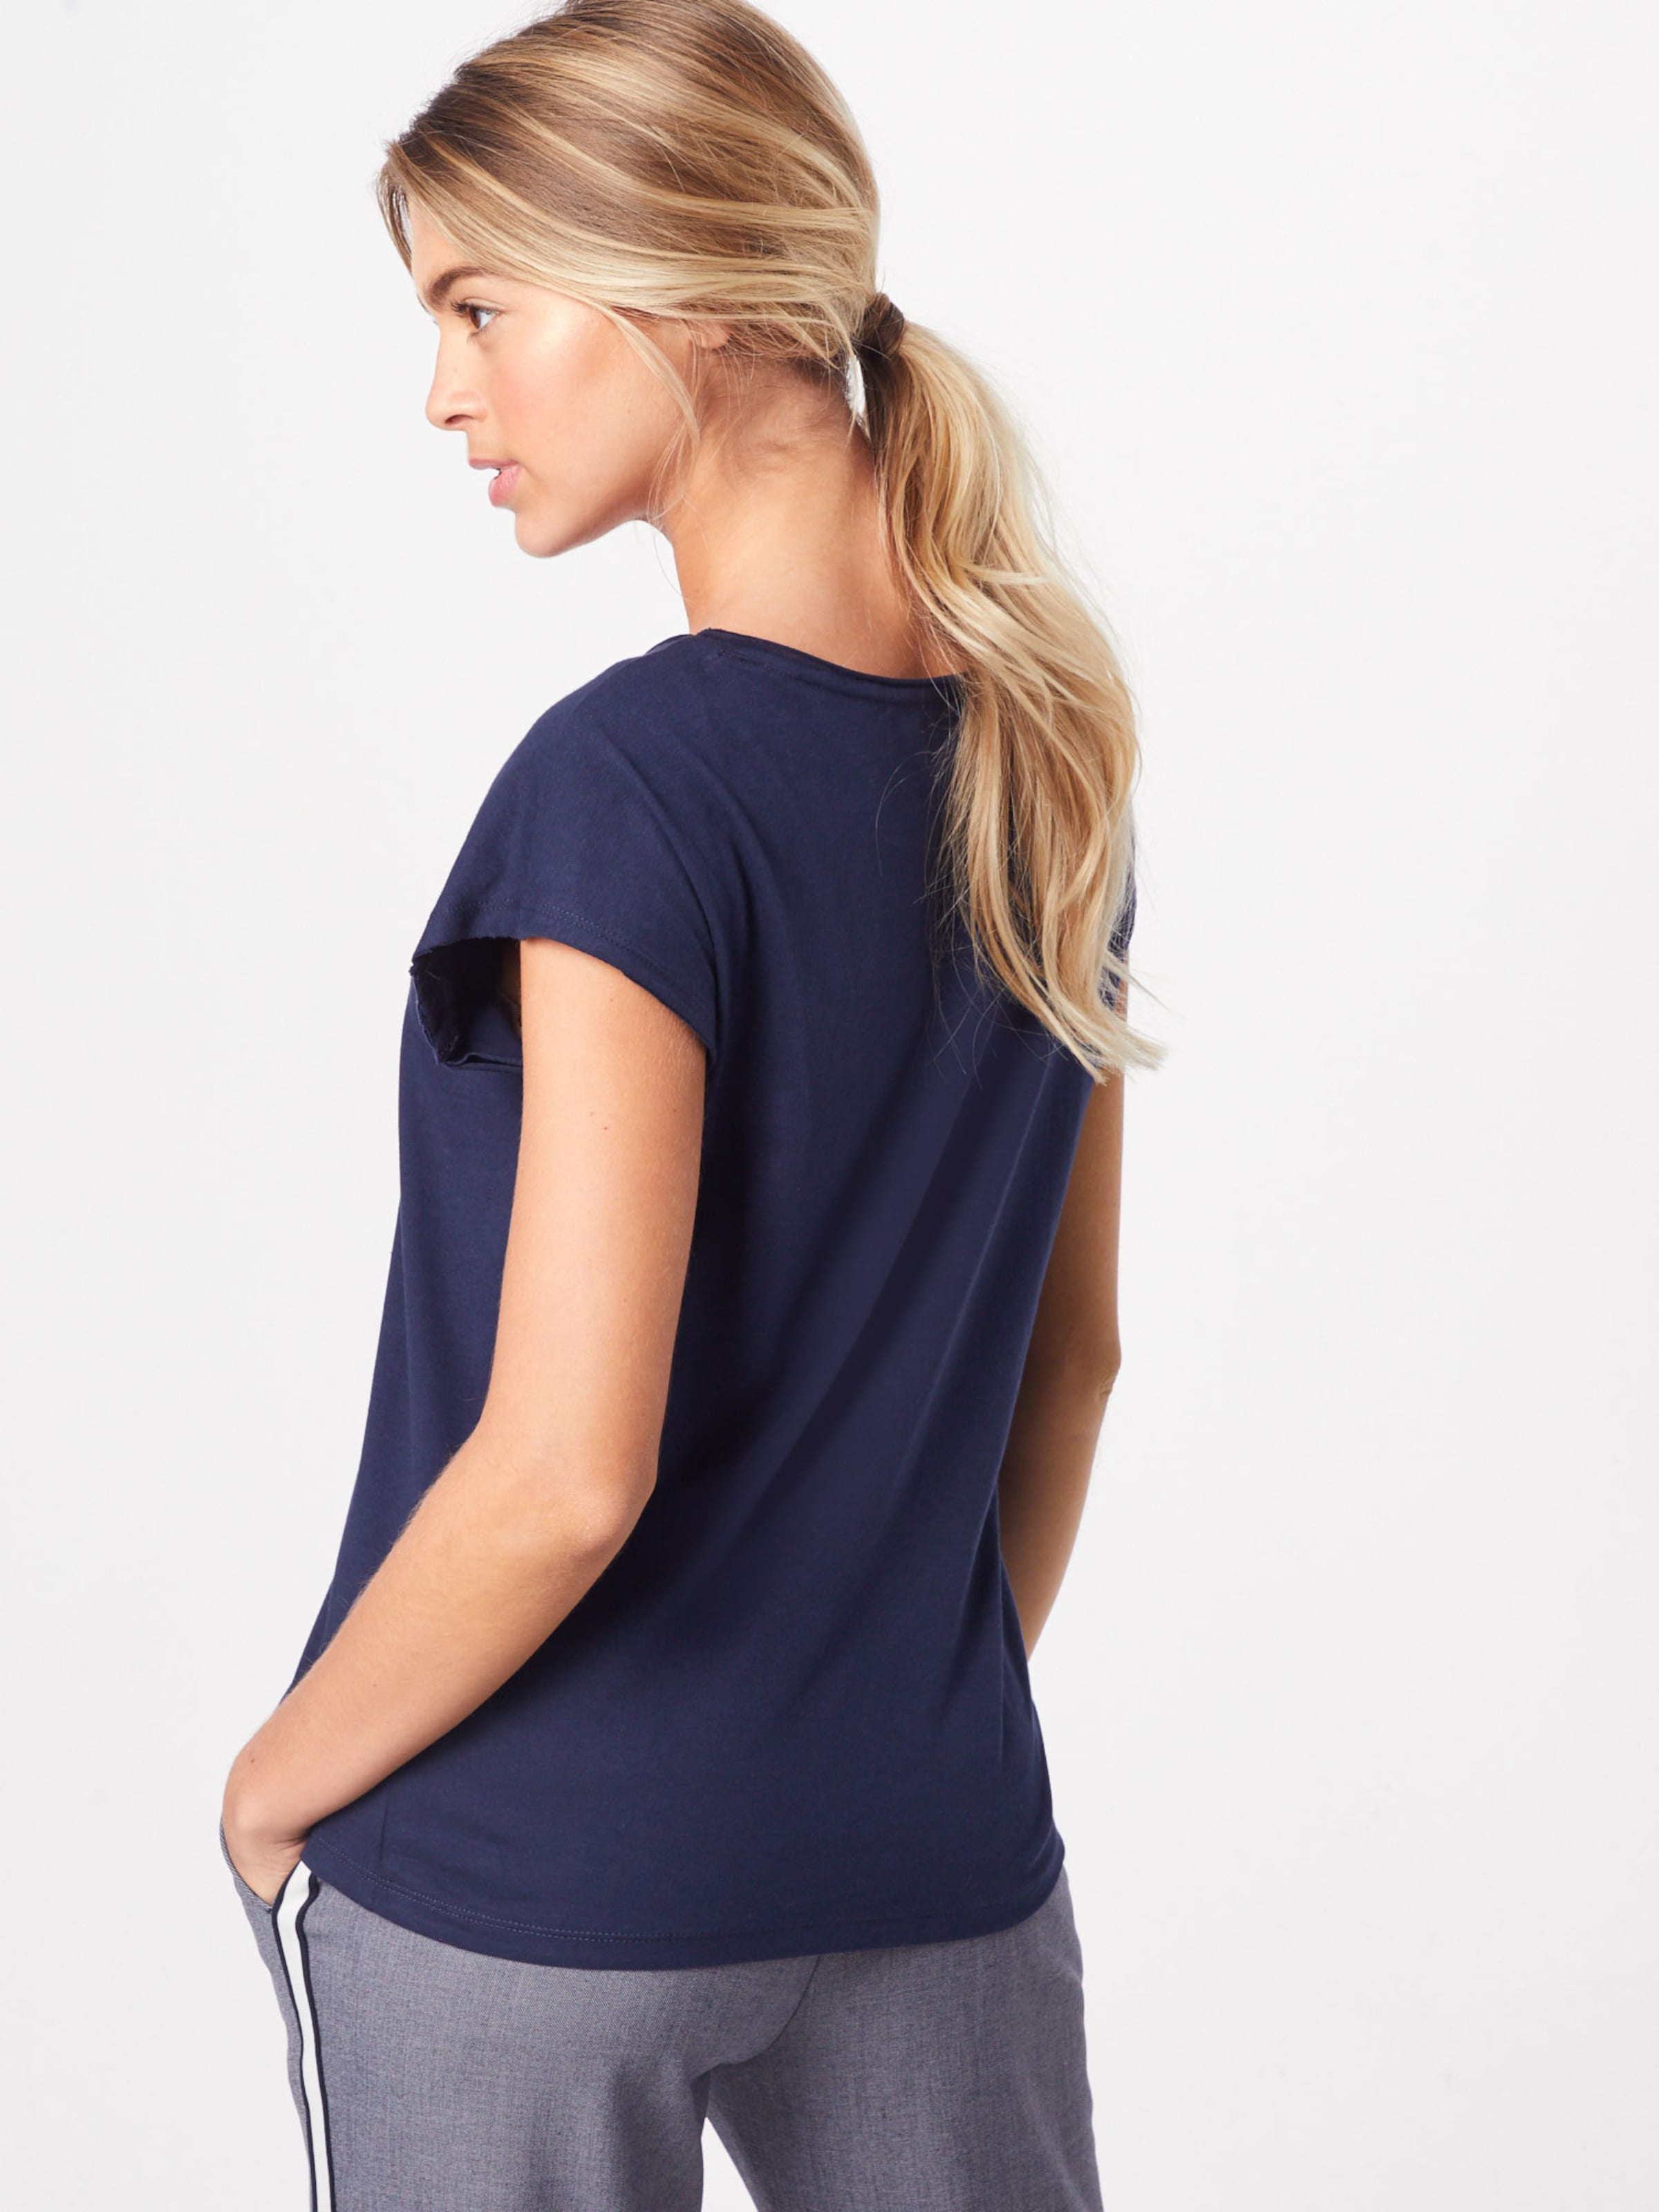 Navy In Shirt Esprit Navy Shirt Esprit Esprit In Shirt u3Tc1JFKl